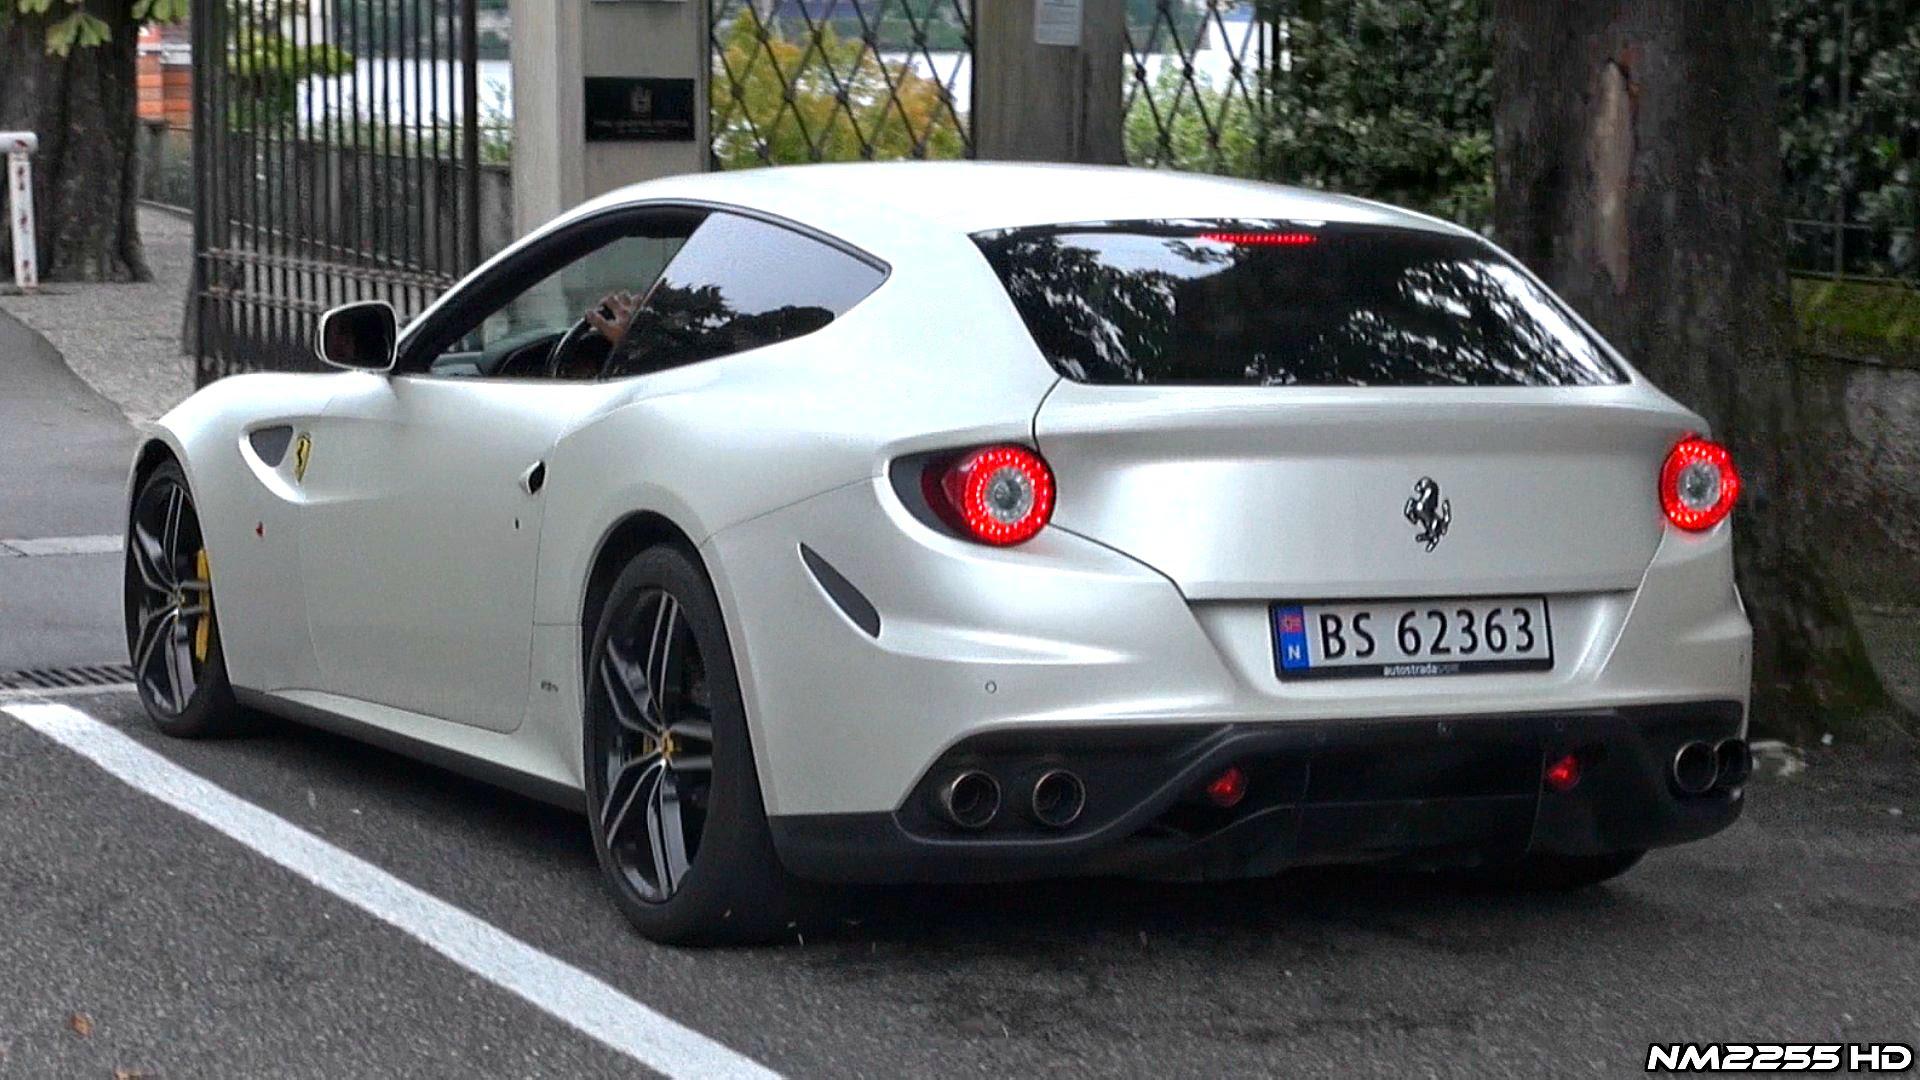 Ferrari Ff Wallpapers Vehicles Hq Ferrari Ff Pictures 4k Wallpapers 2019